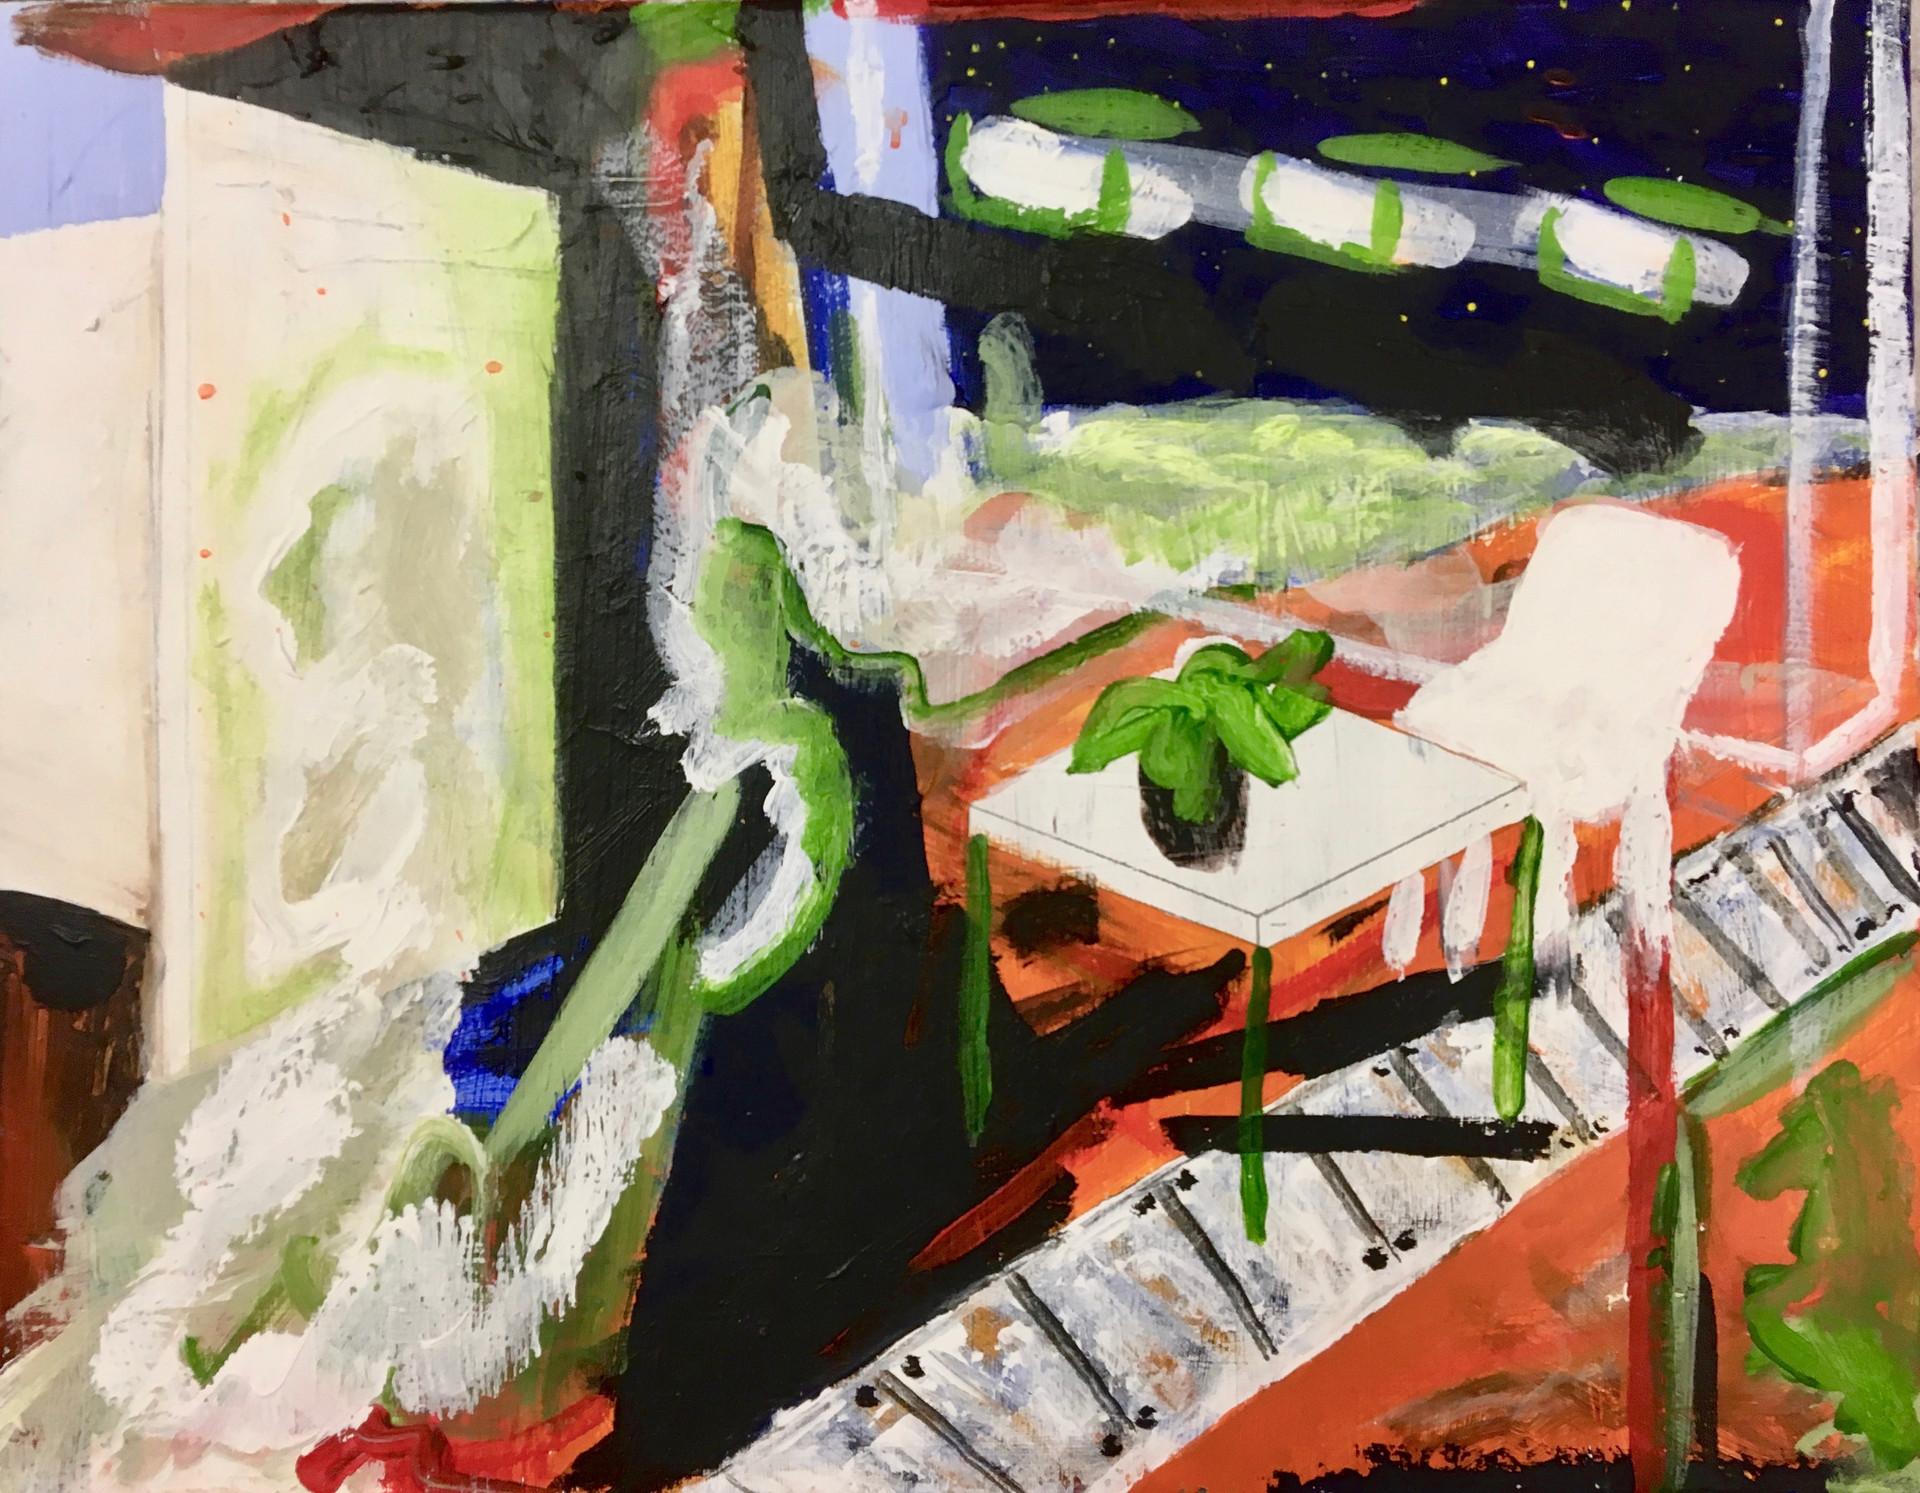 Psychological Space, 2017, acrylic on canvas, 46 x 36 cm